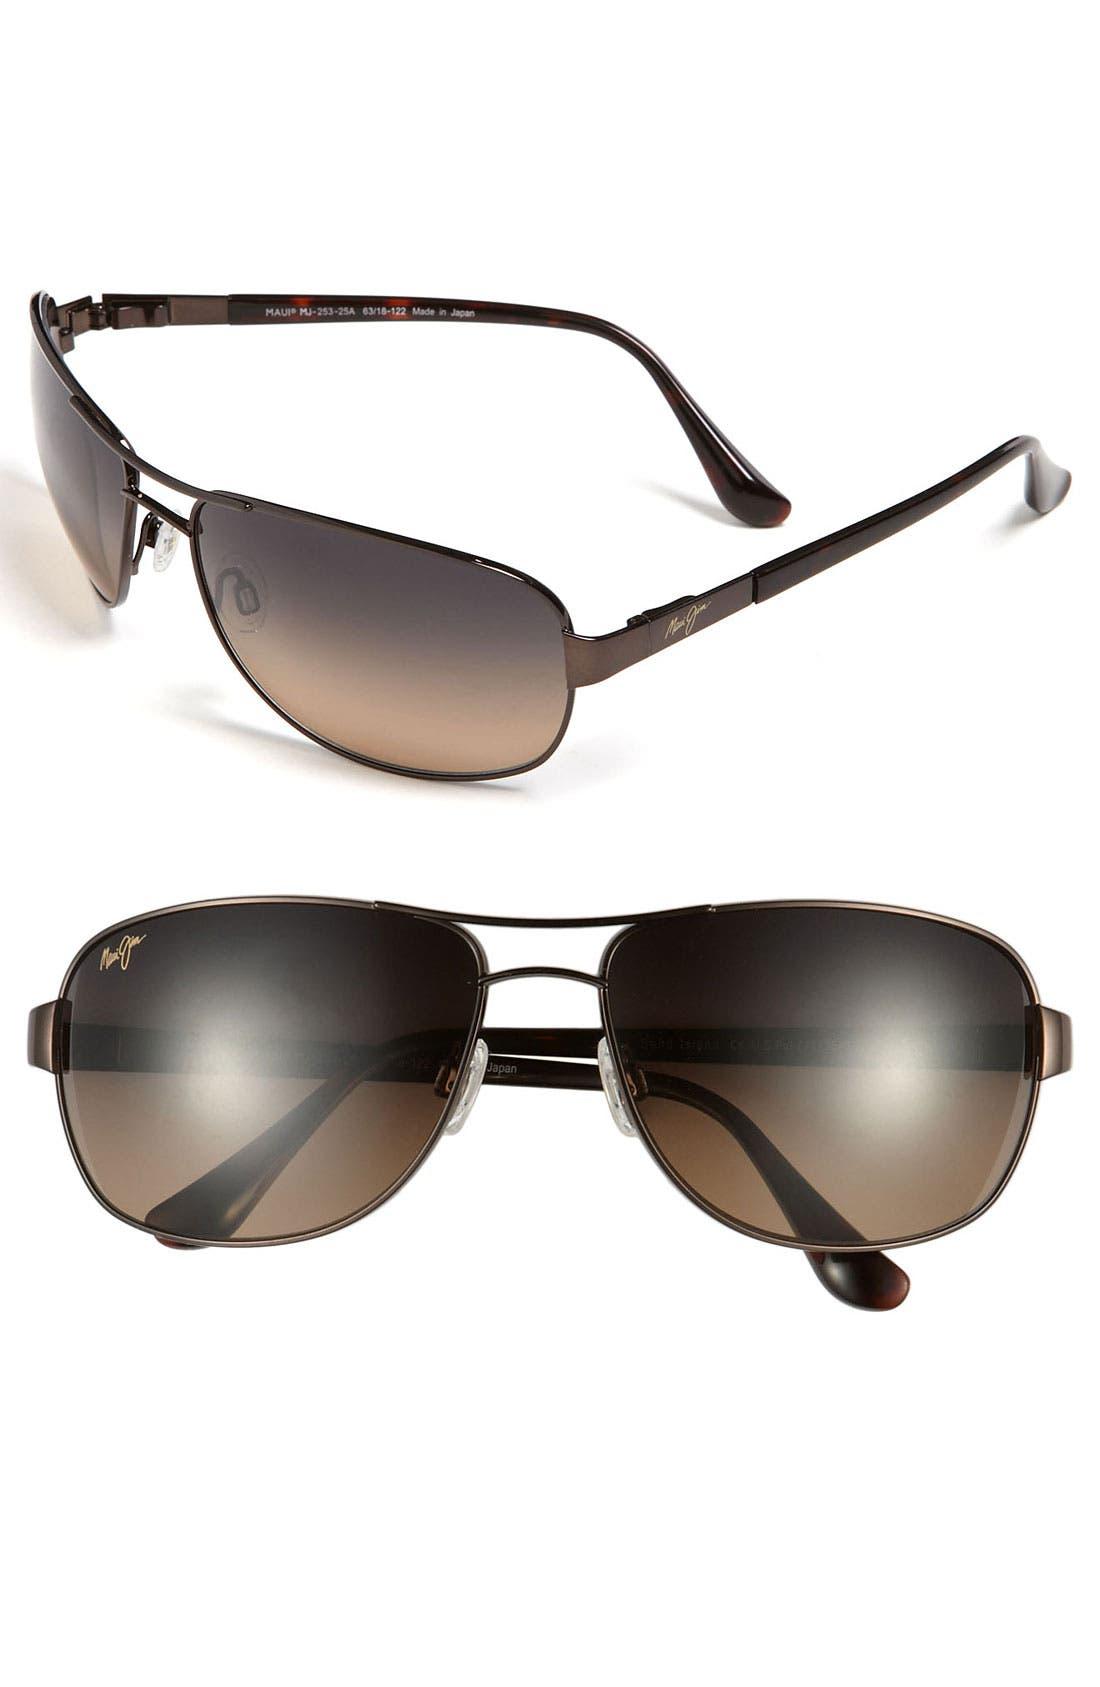 Maui Jim 'Sand Island' PolarizedPlus®2 63mm Sunglasses